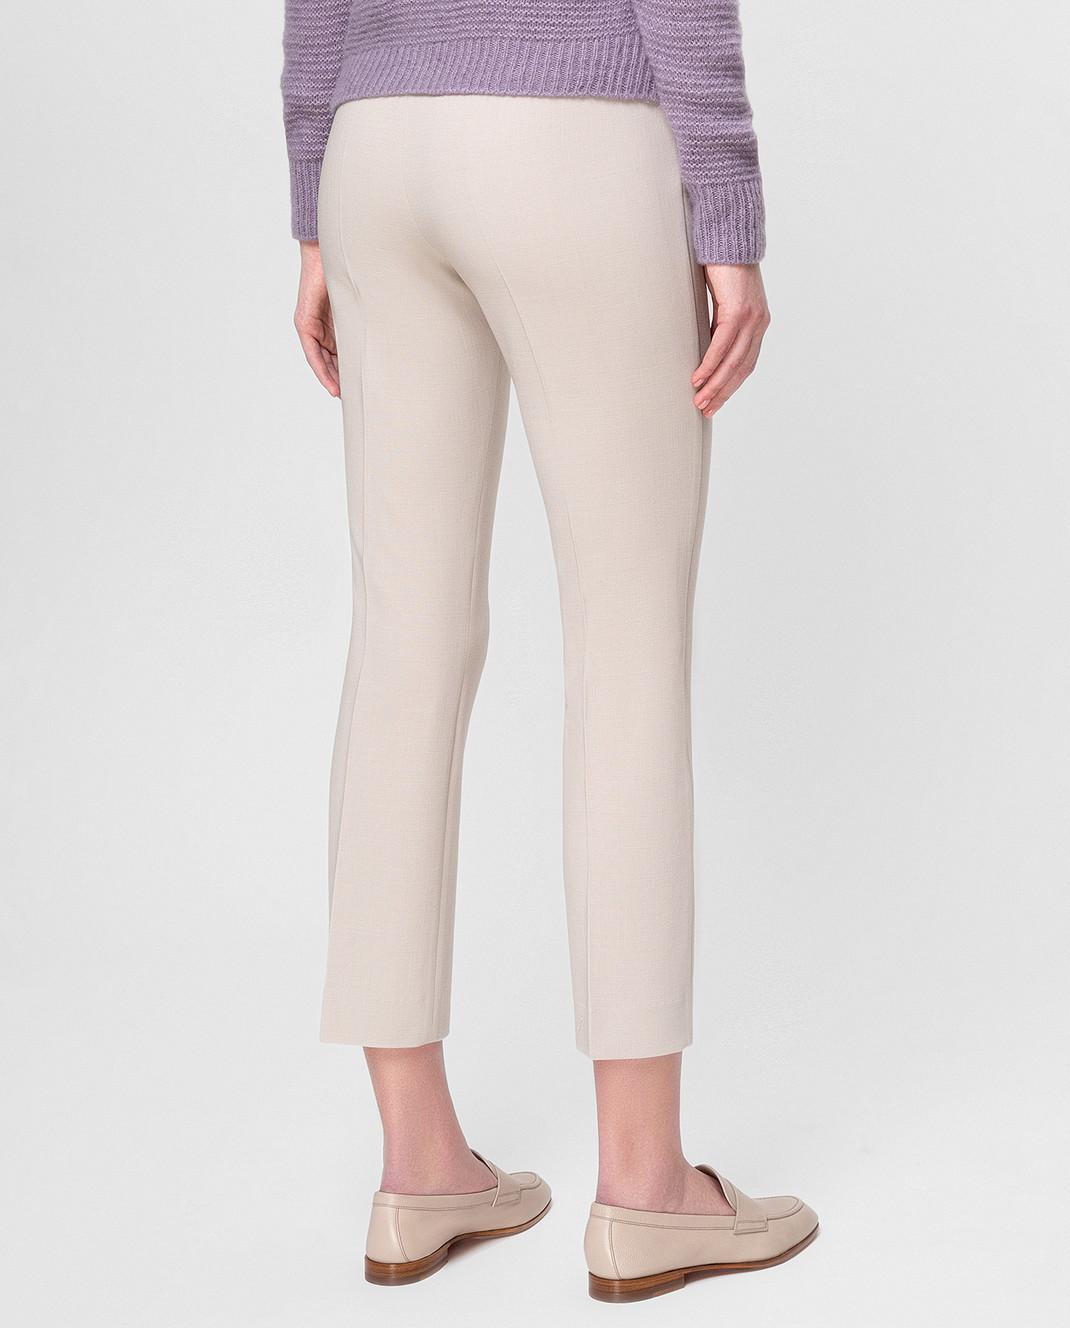 Max Mara Светло-бежевые брюки из шерсти OSTILE изображение 4